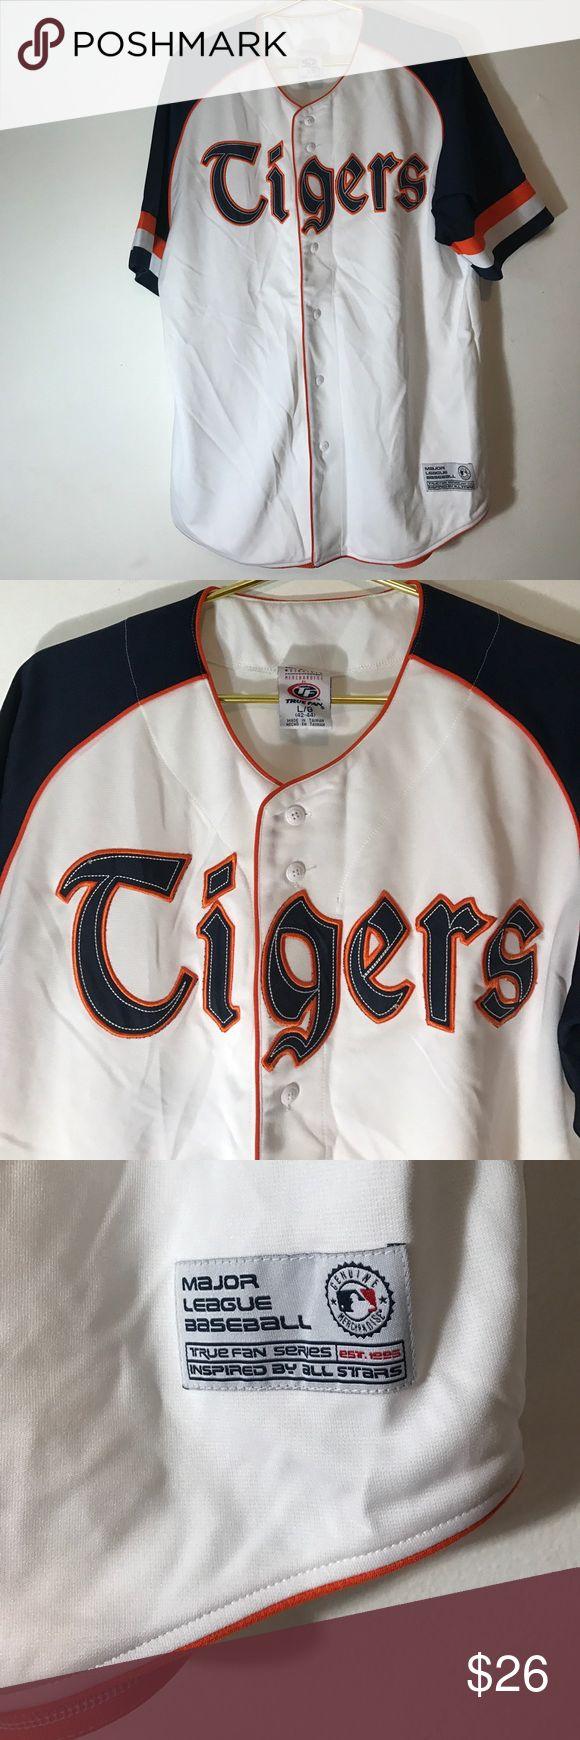 Men's Detroit Tigers baseball jersey Detroit Tigers MLB baseball jersey in a Large. True fan series. Shirts Tees - Short Sleeve